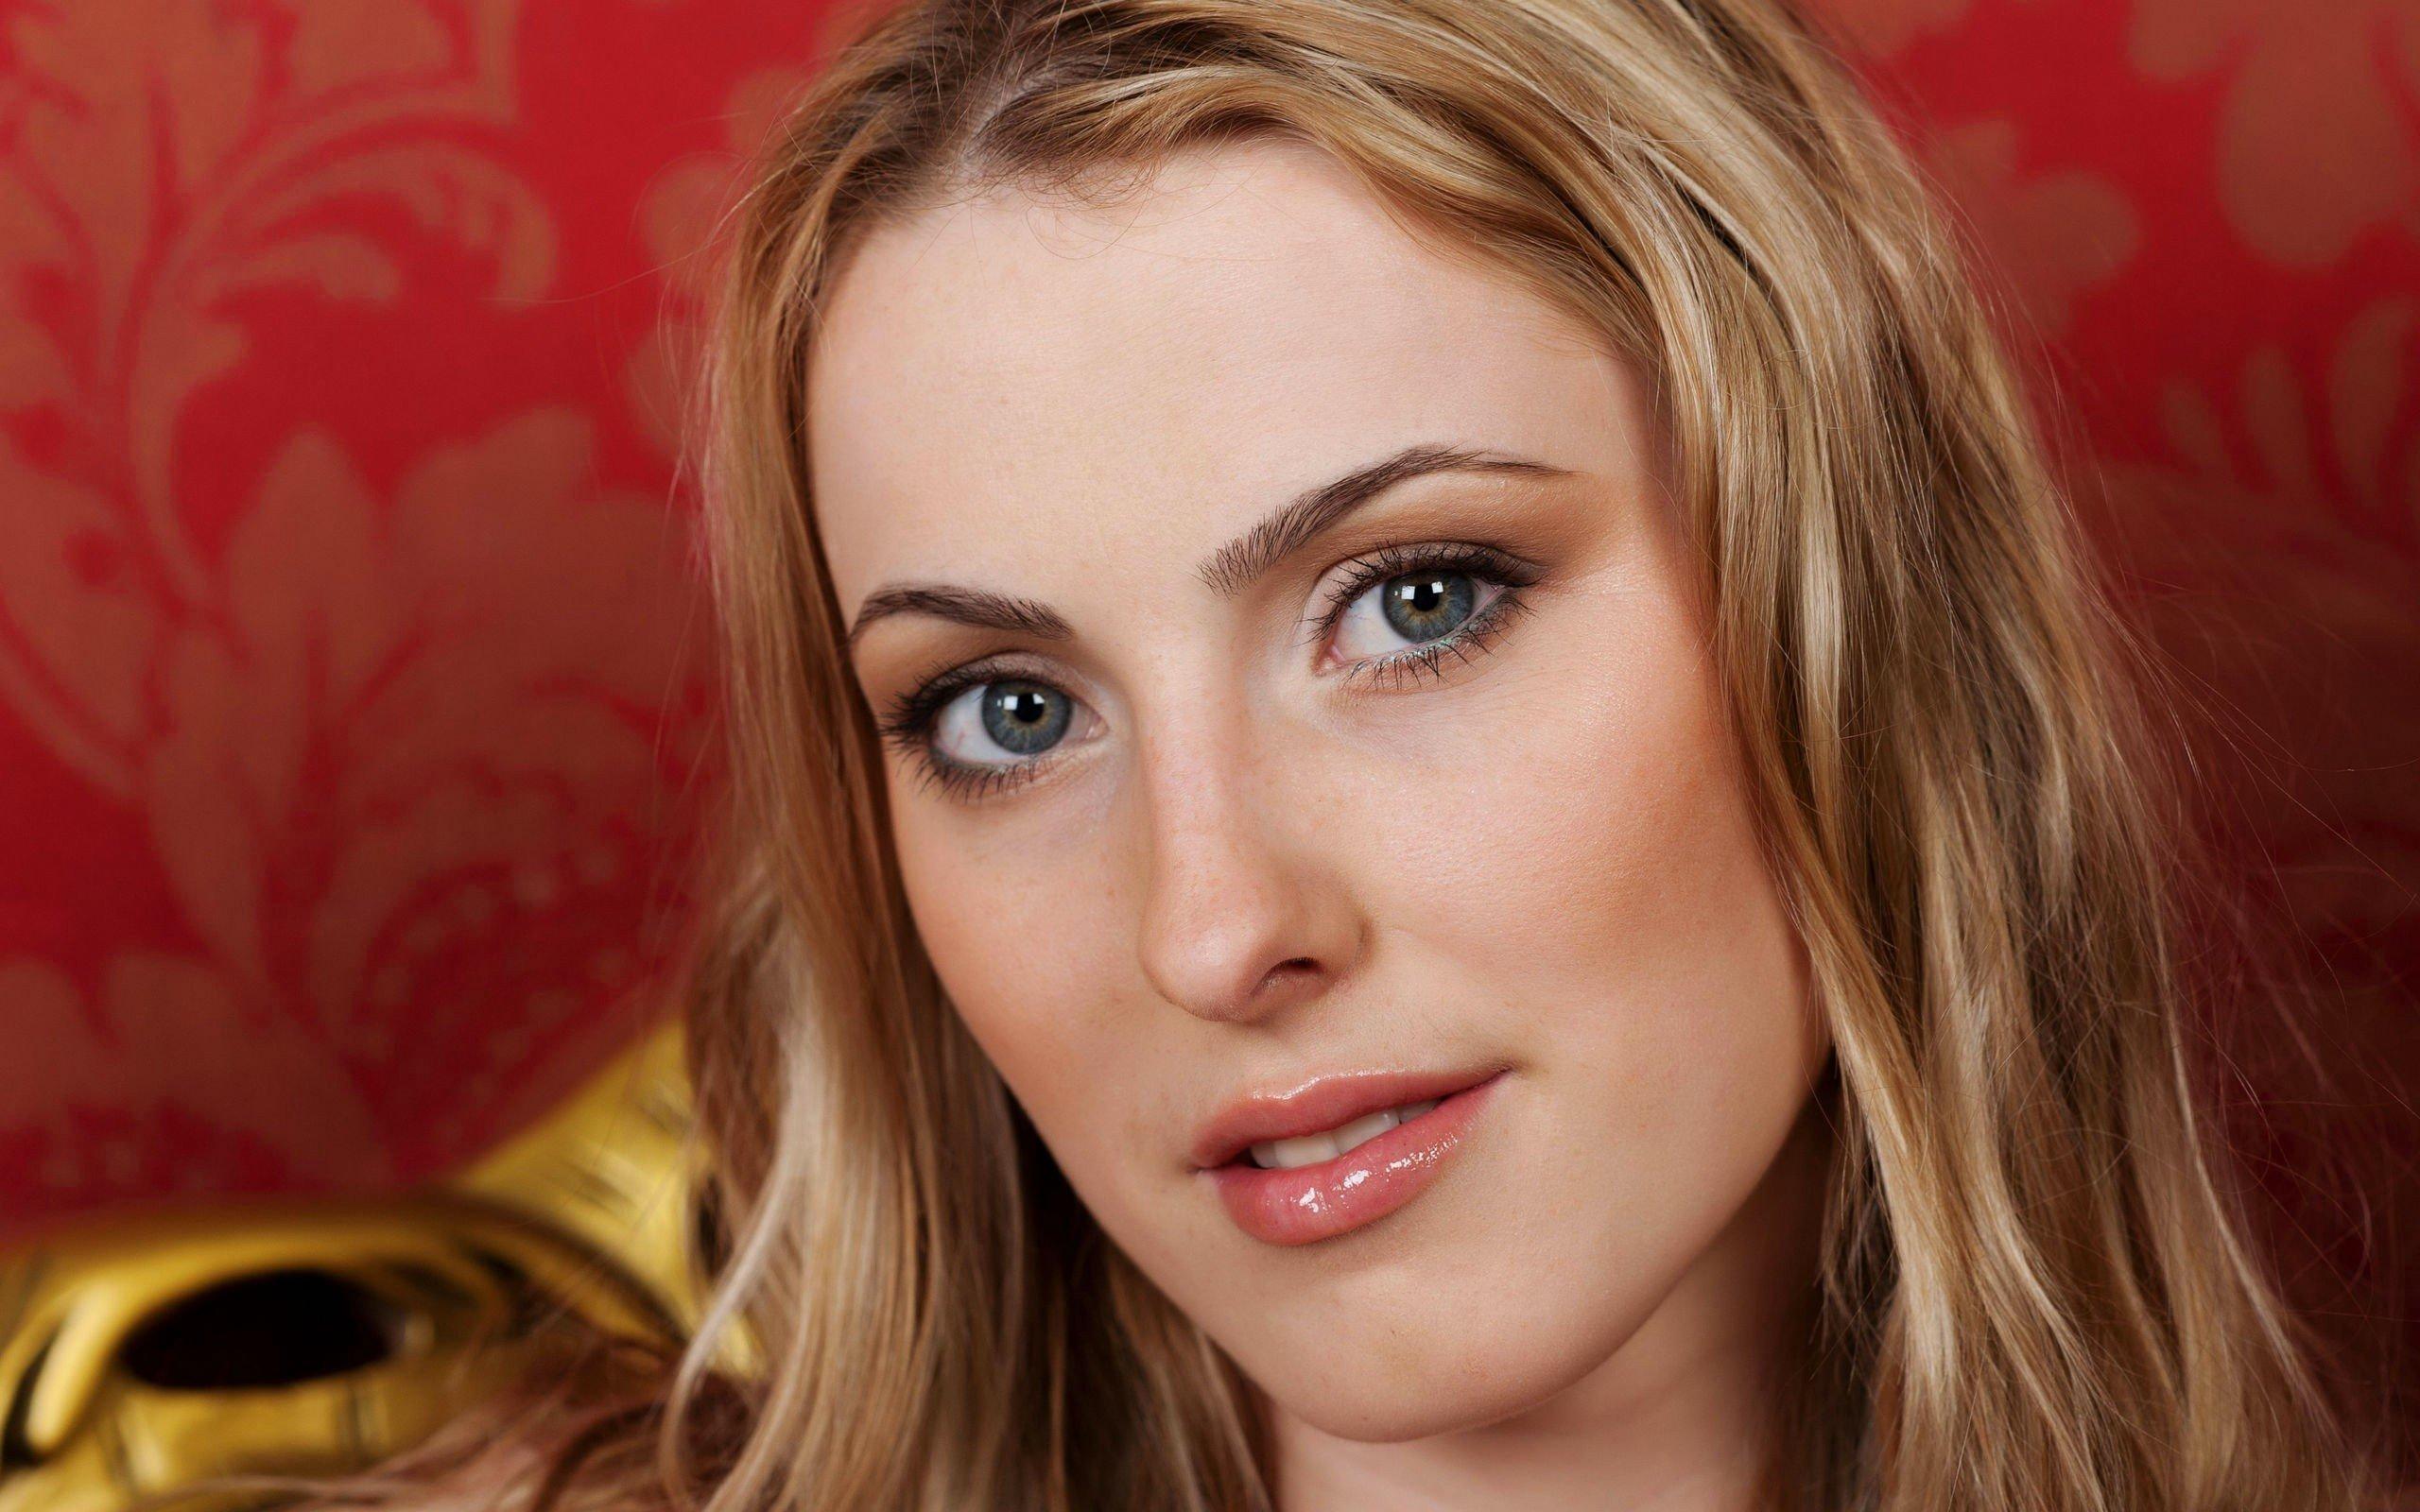 Blondes women blue eyes models Femjoy magazine faces ...